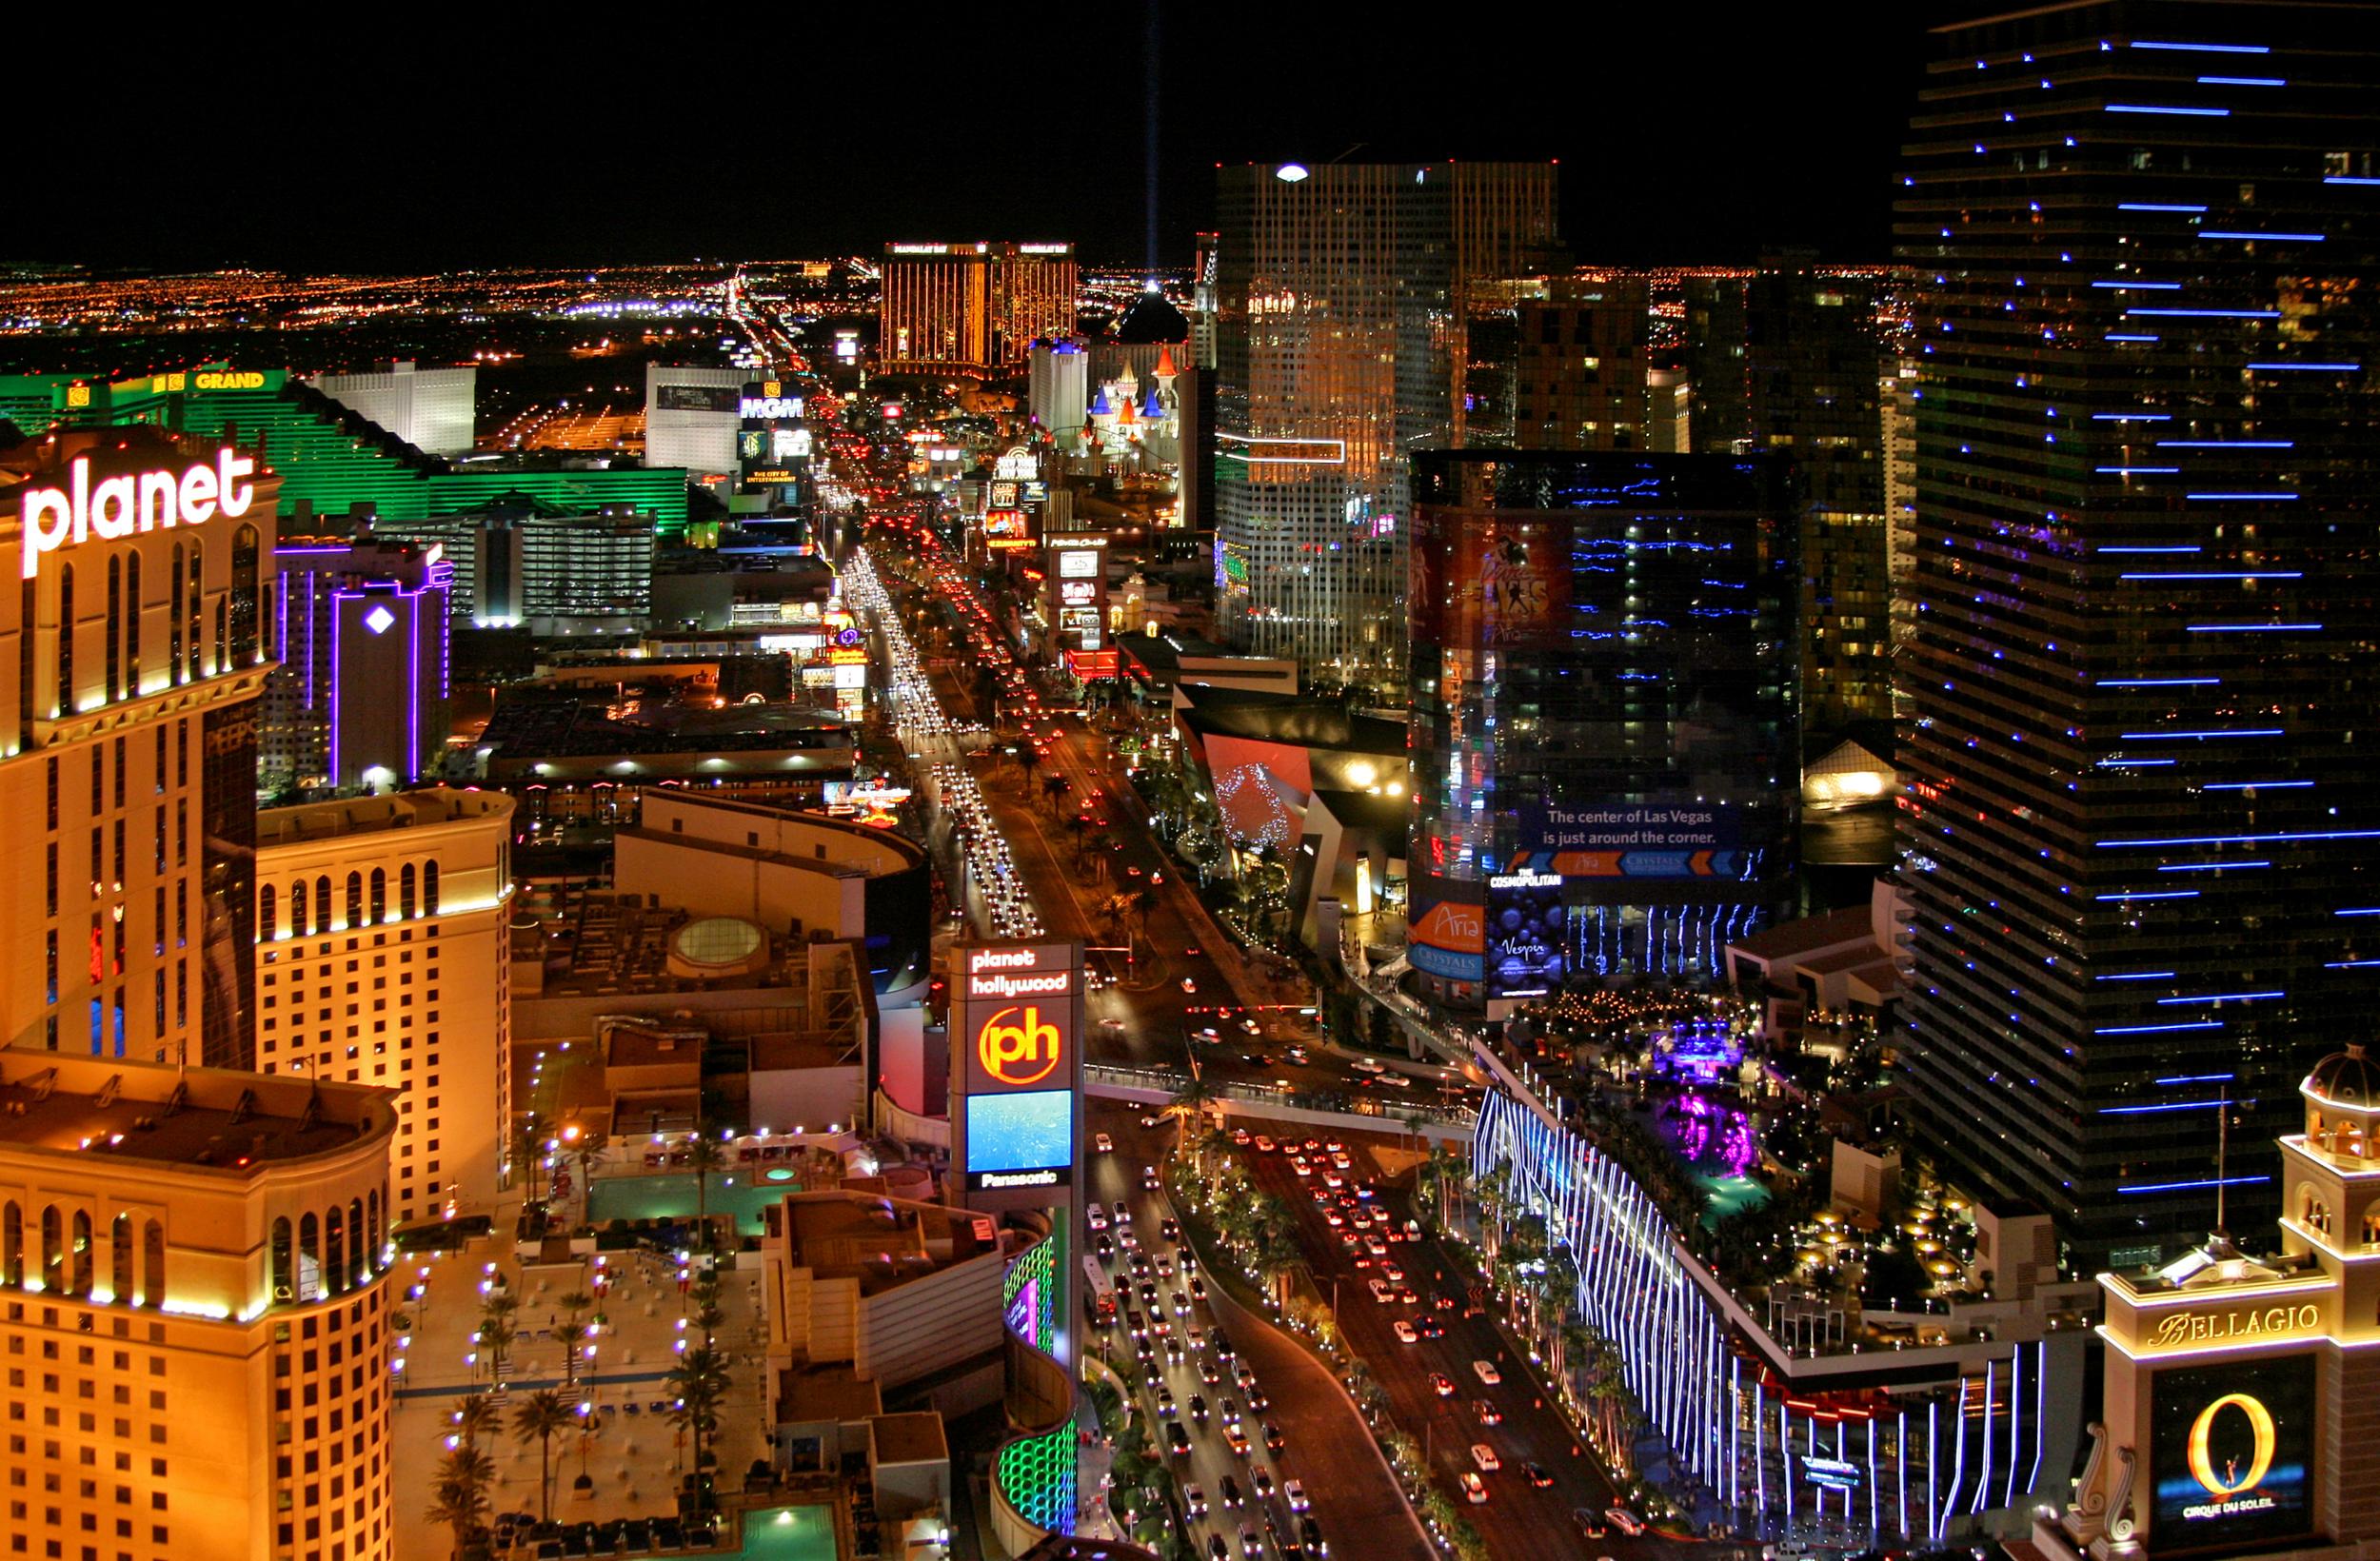 Las_Vegas_Strip_at_night,_2012.jpg